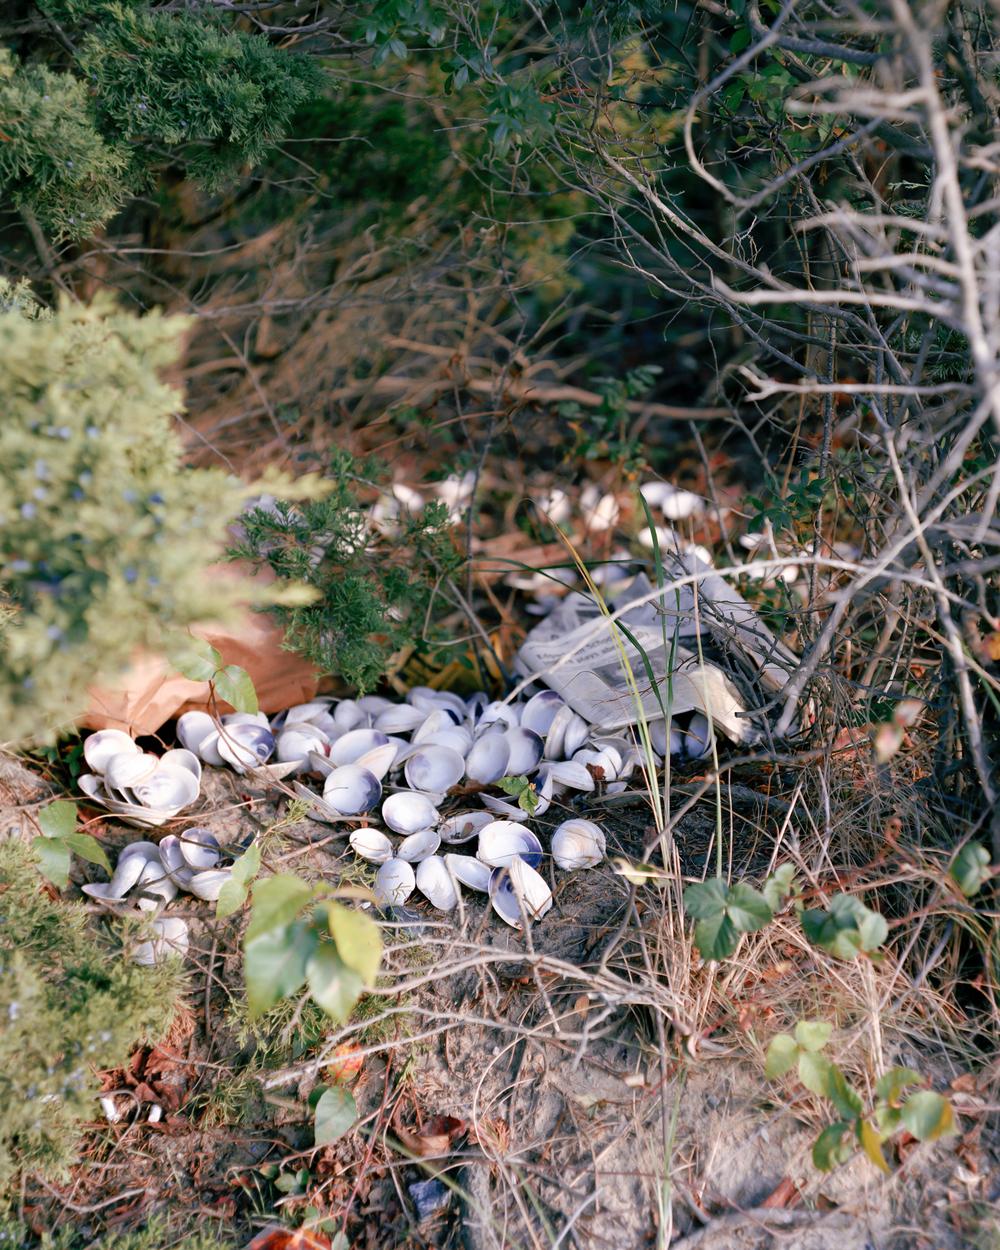 025 shells and newspaper copy.jpg